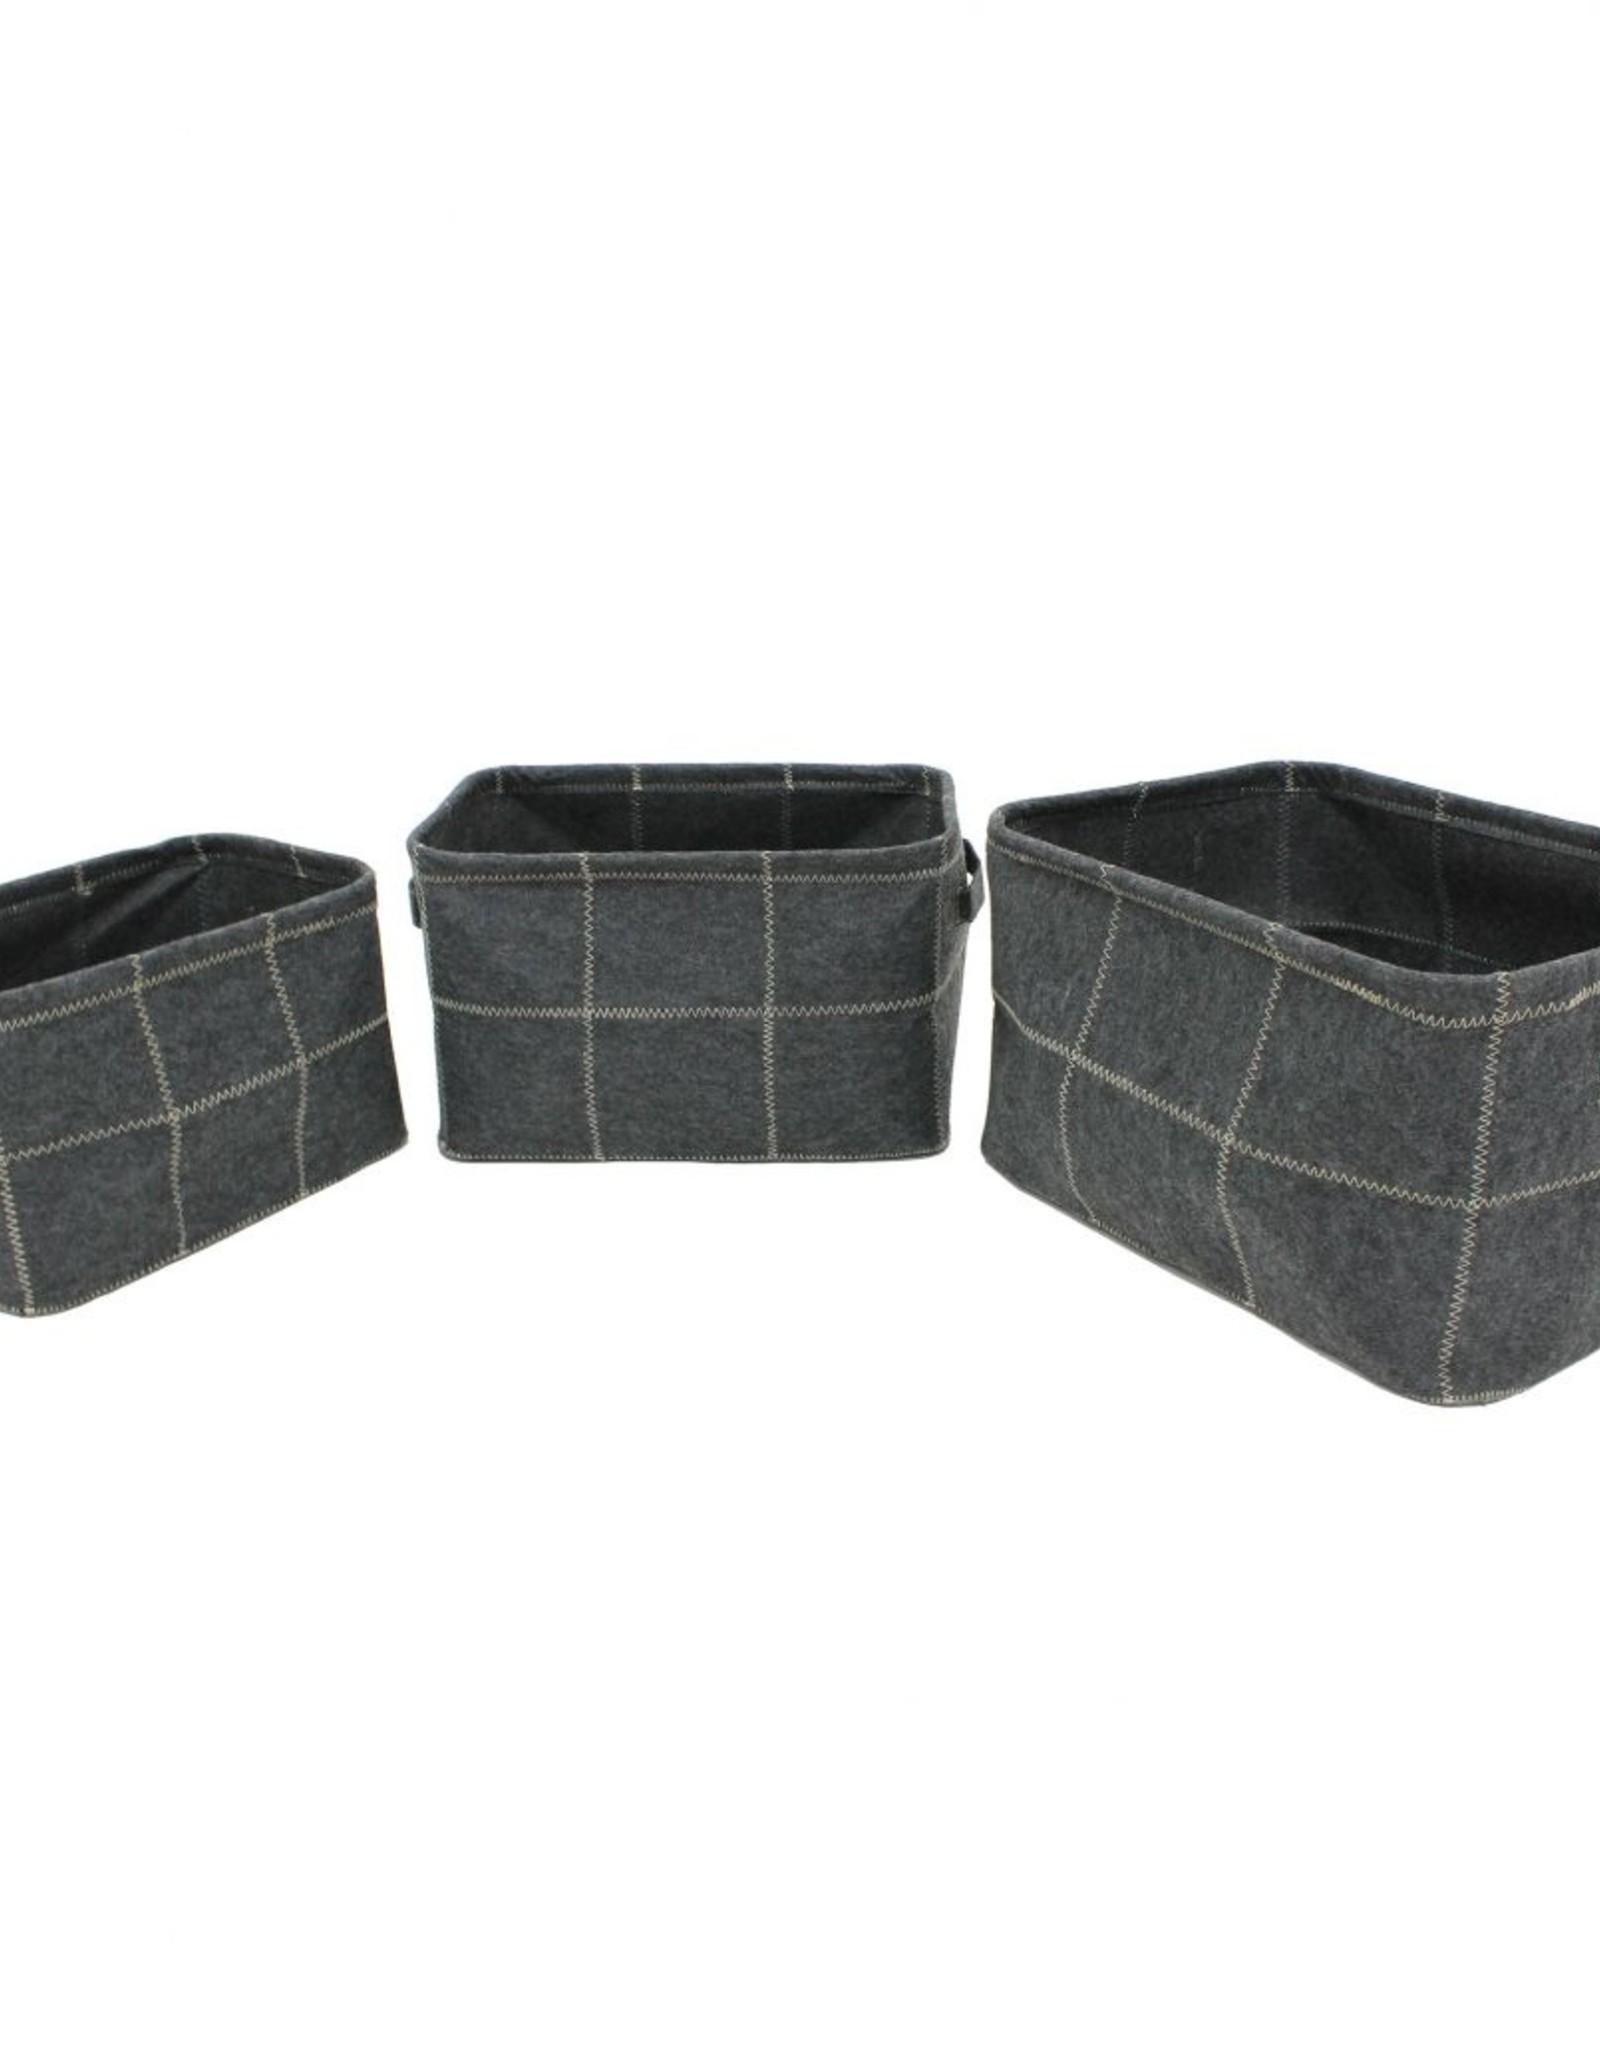 "Cathay Basket Cathay Grey Felt Rectangle 14""L 10-2512"